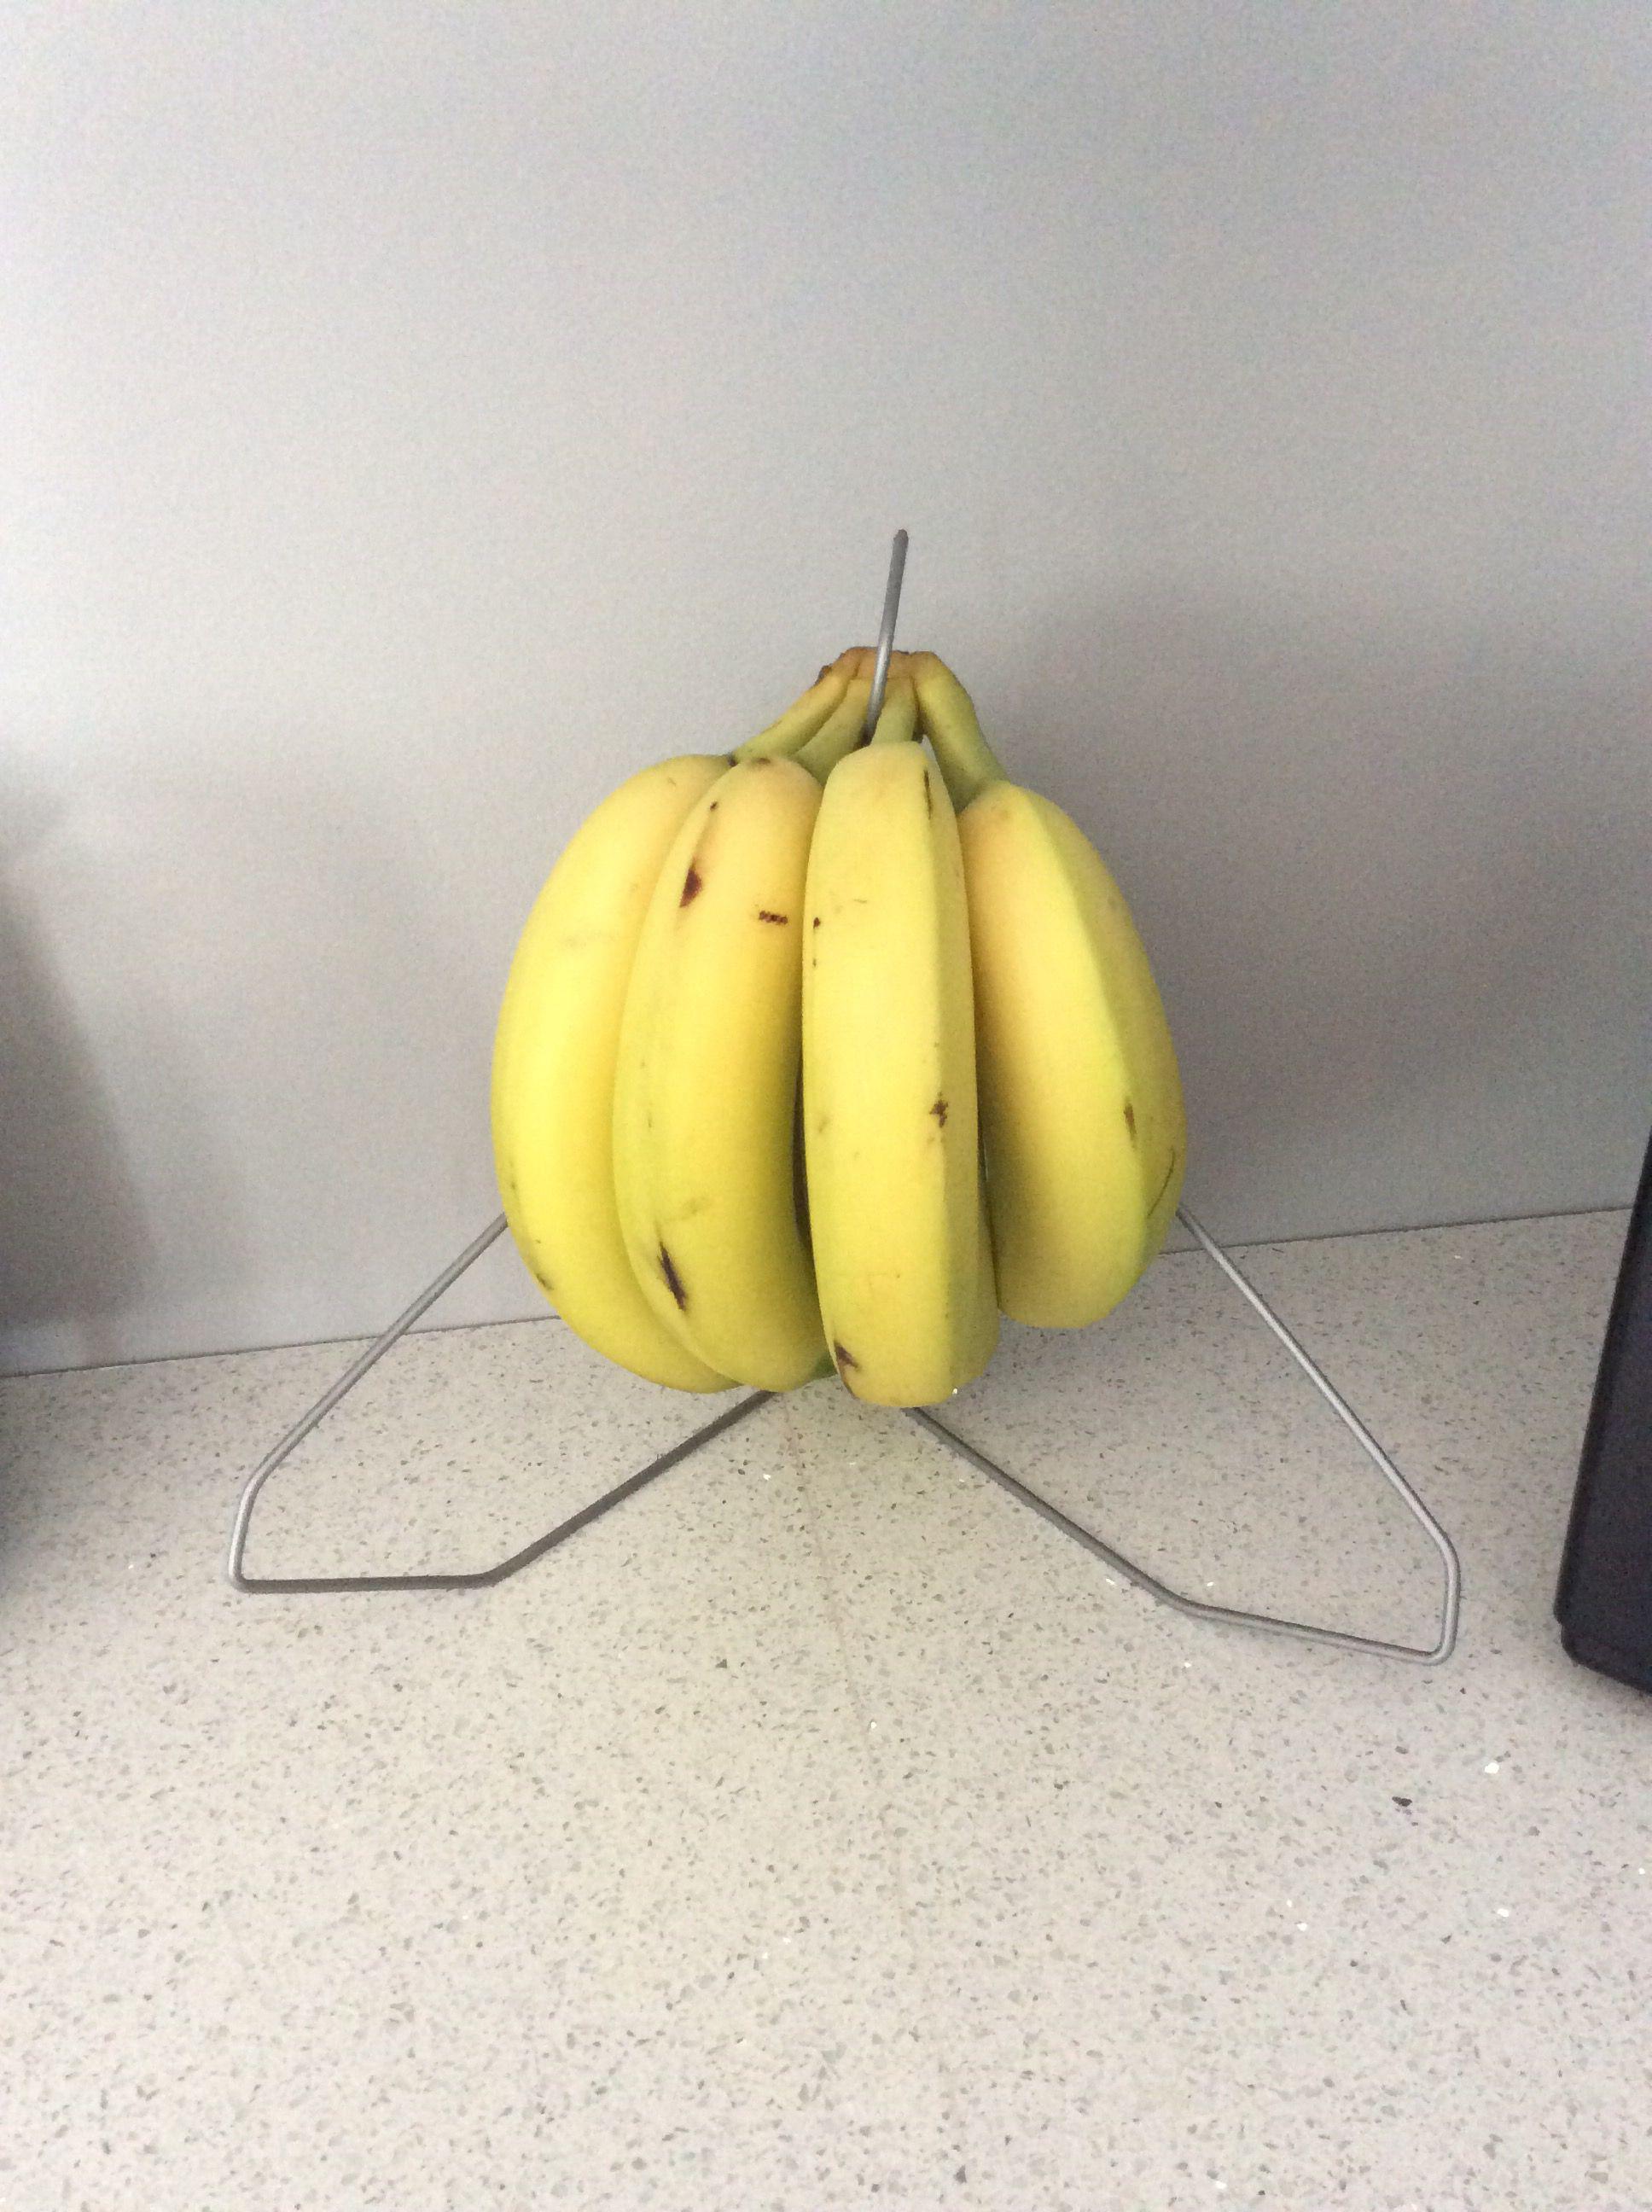 Banana Rack Diy With A Hanger Banana Storage Hanger Diy Banana